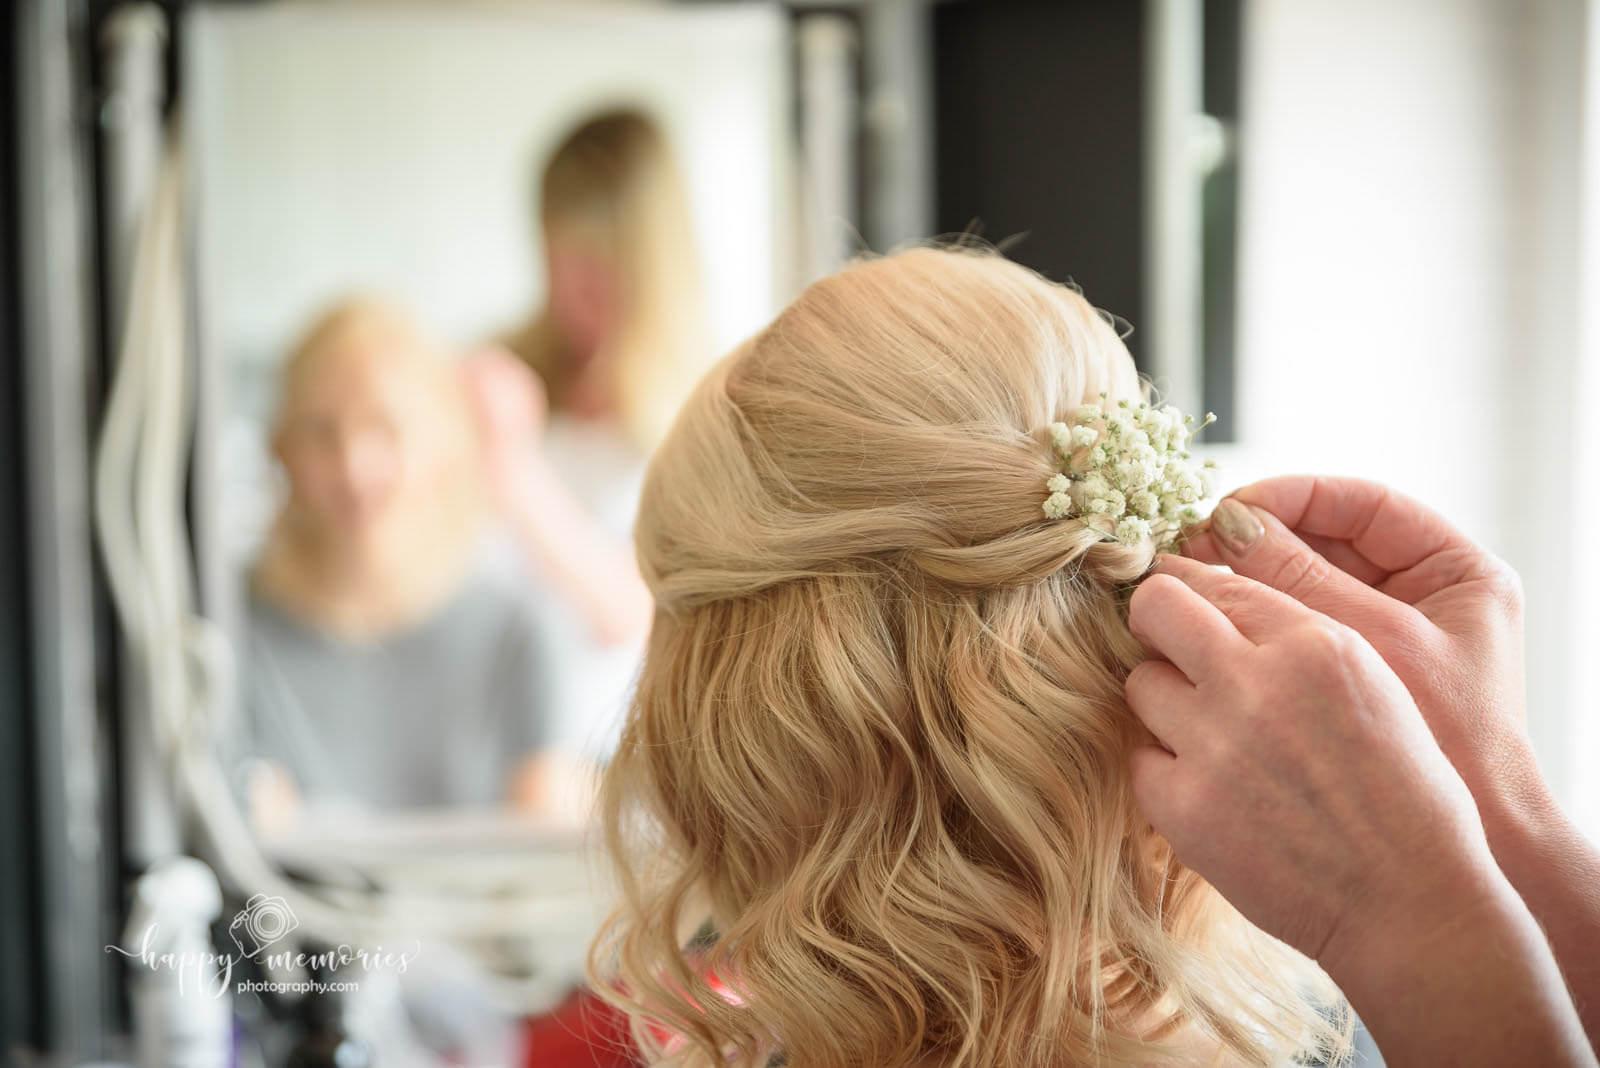 Wedding photographer East Grinstead-18